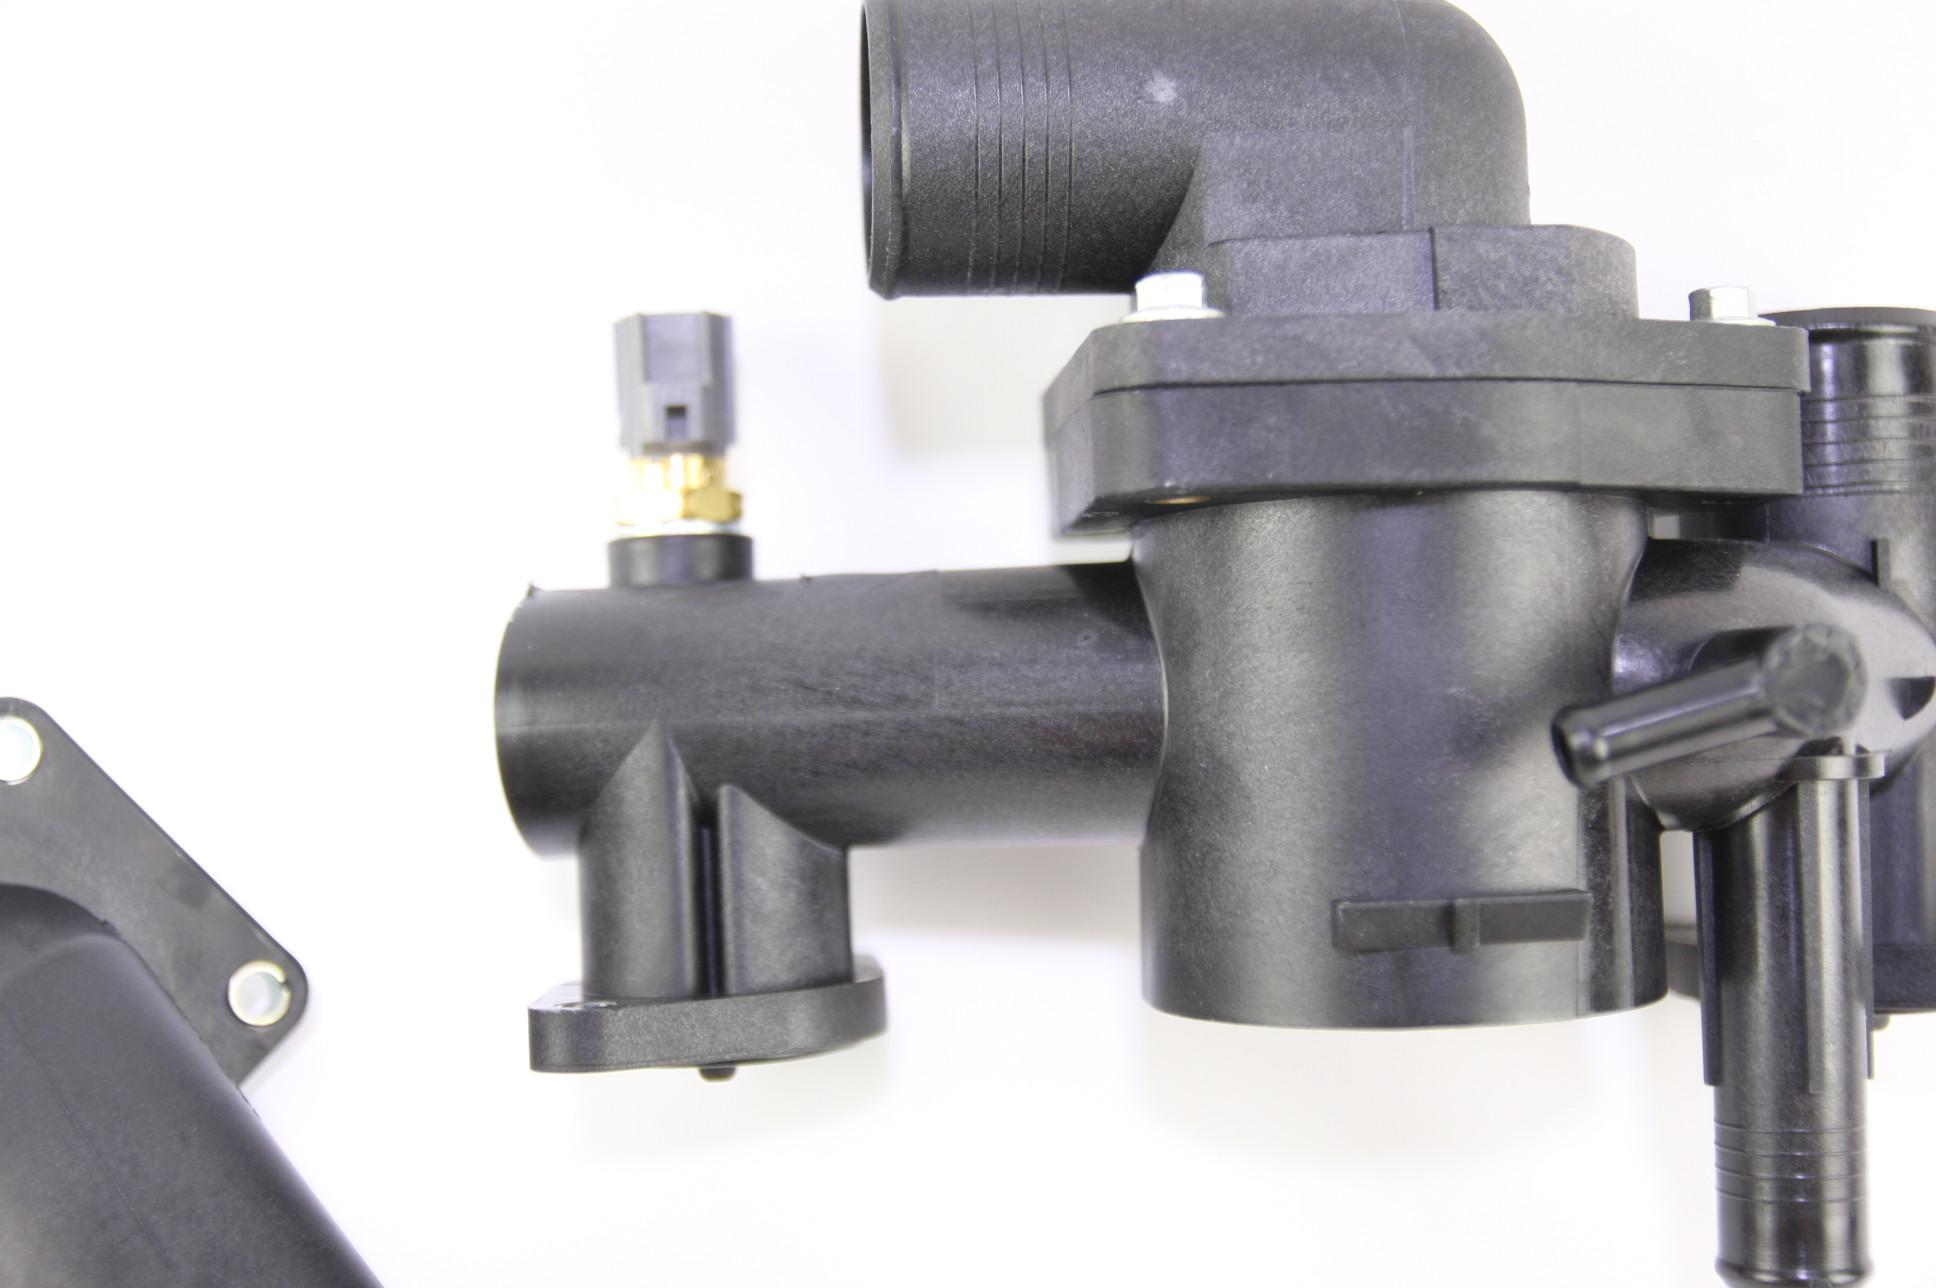 ** New OEM AJ89486 Jaguar 03-06 XK8 4.2L V8 Engine Coolant Thermostat Housing - image 6